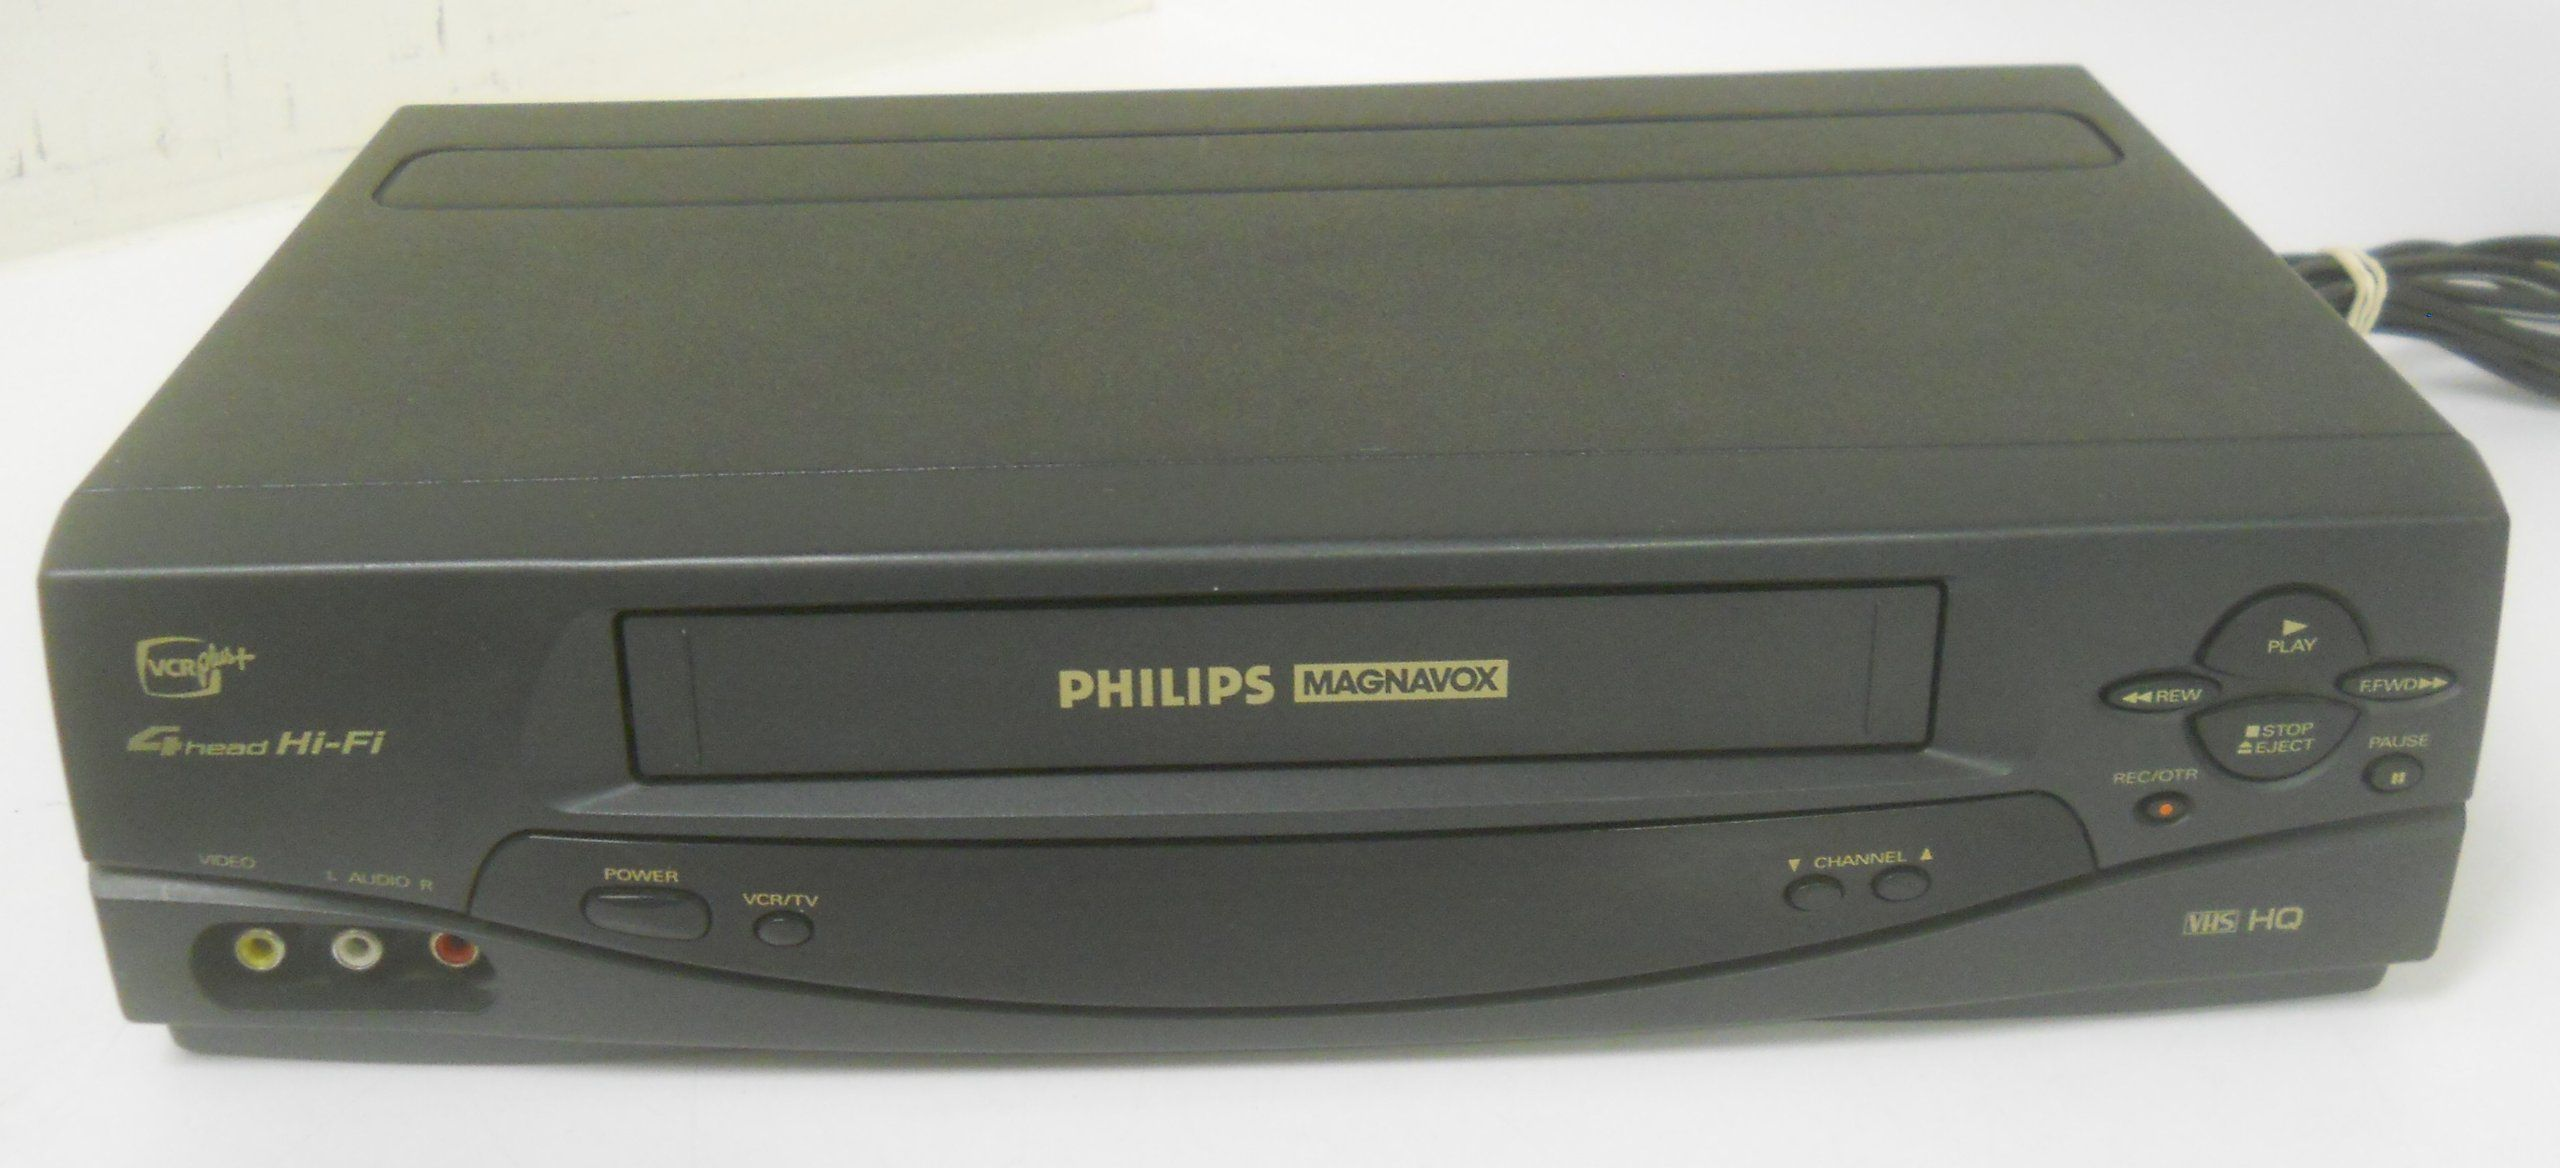 Philips Magnavox Vrz262at22 Vrz262 Hifi Stereo Video Cassette Recorder Player Vcr Vhs Tape Play Back Cable Tuner 4 Head Hifi Cassette Recorder Philips Cassette